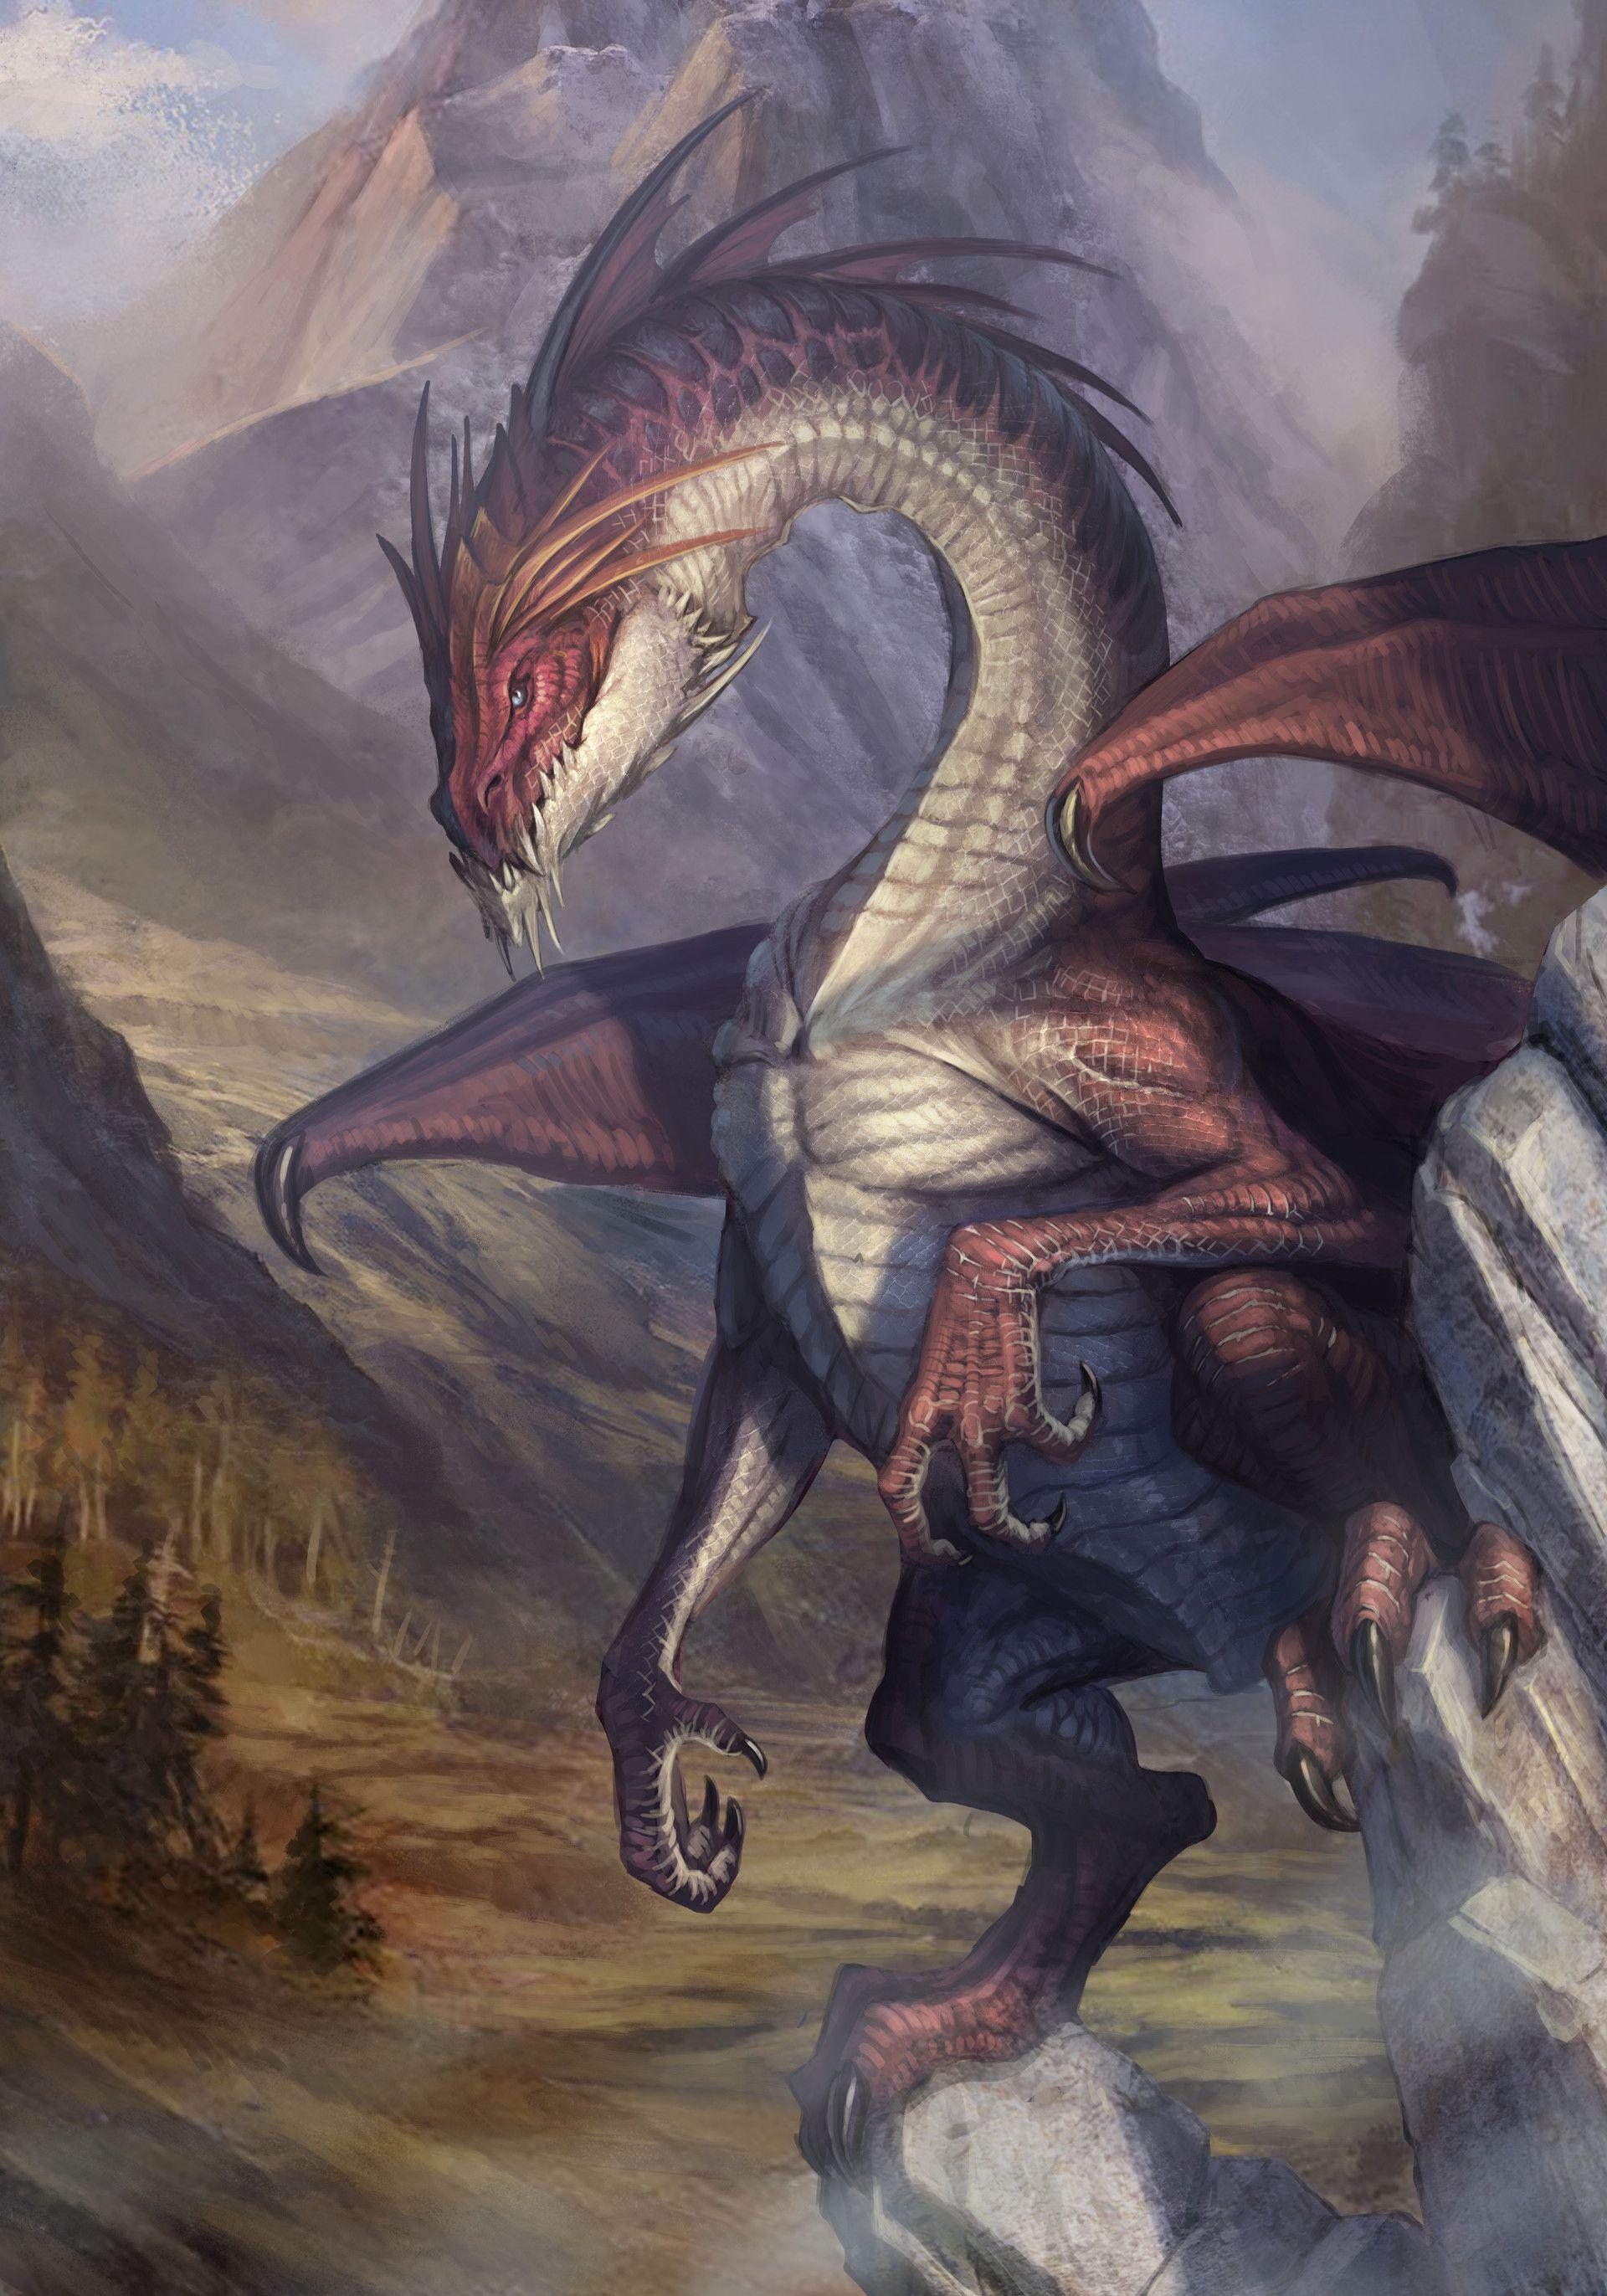 ArtStation - Rock dragon, Klaher Baklaher | Dragon ...